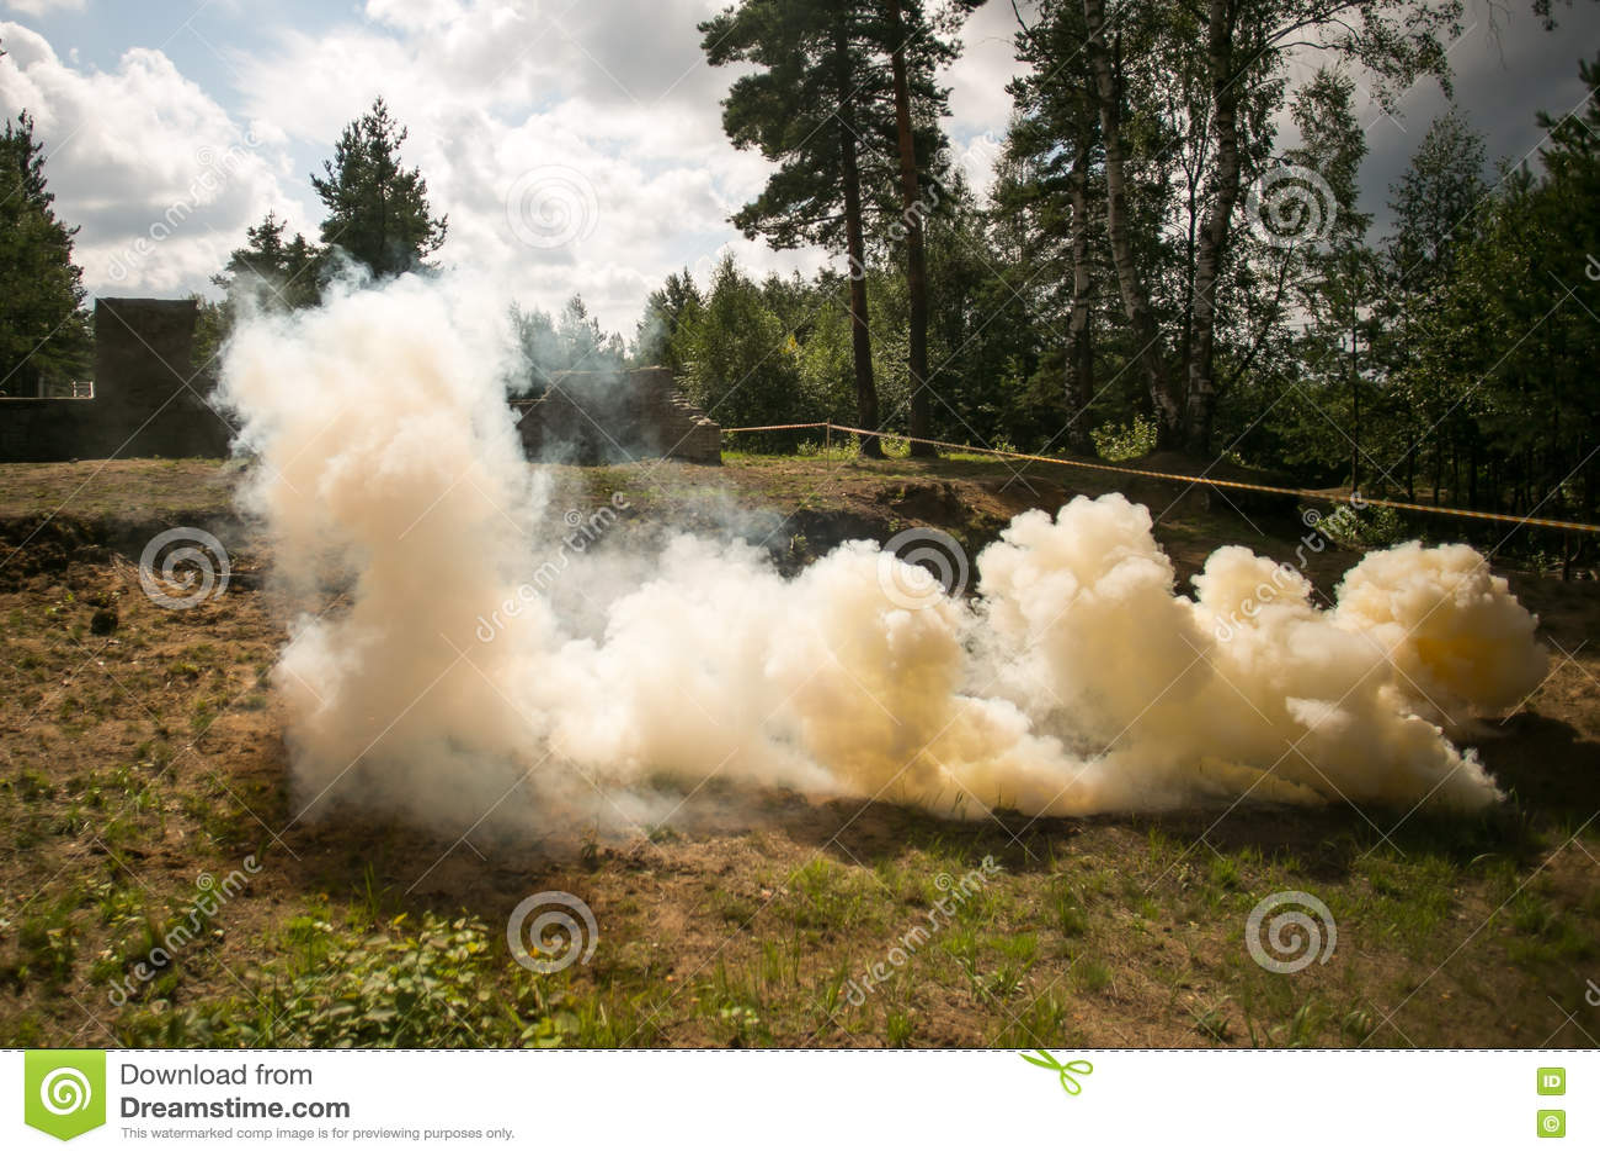 Orange army smoke bomb stock image  Image of military - 75412413